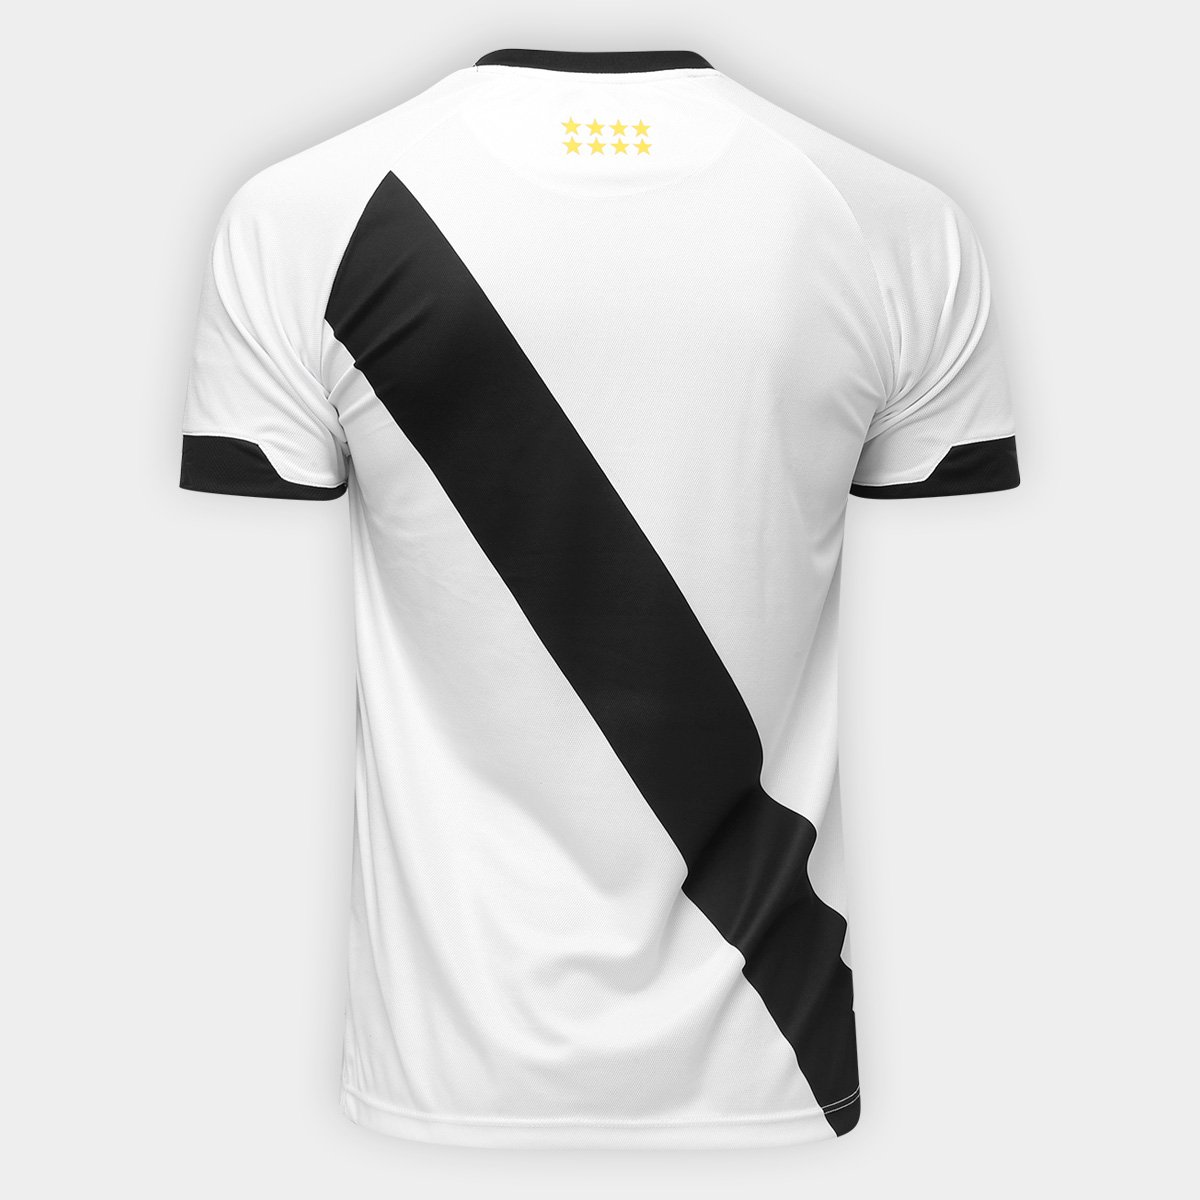 Camisa Vasco 2 torcedor 2020 Diadora